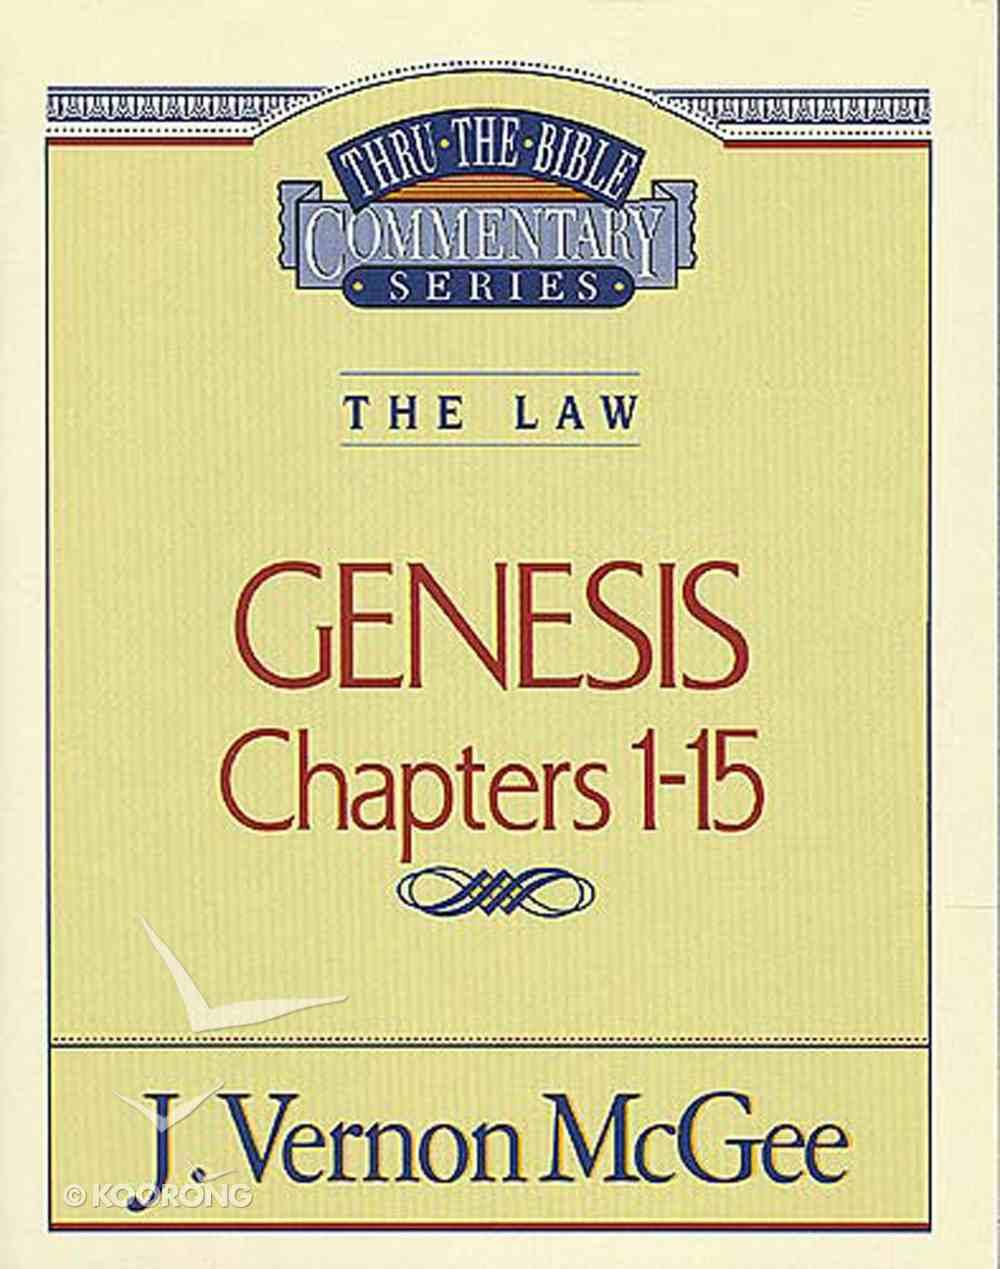 Thru the Bible #01: Genesis (Volume 1) (#01 in Thru The Bible Old Testament Series) eBook